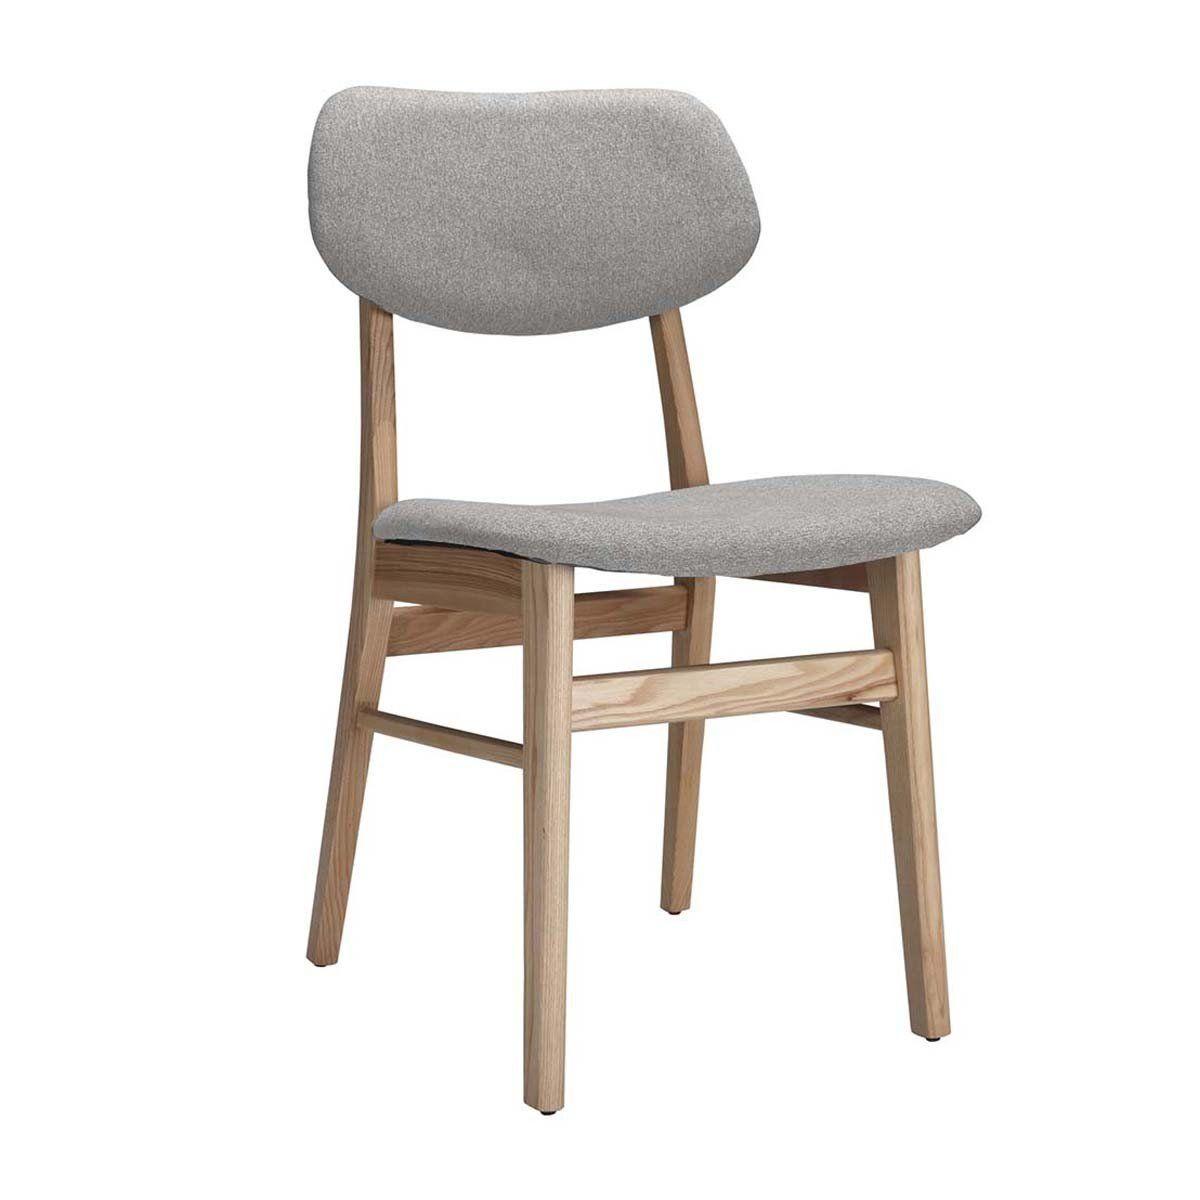 Life Interiors Ari Dining Chair Ash Light Grey Modern